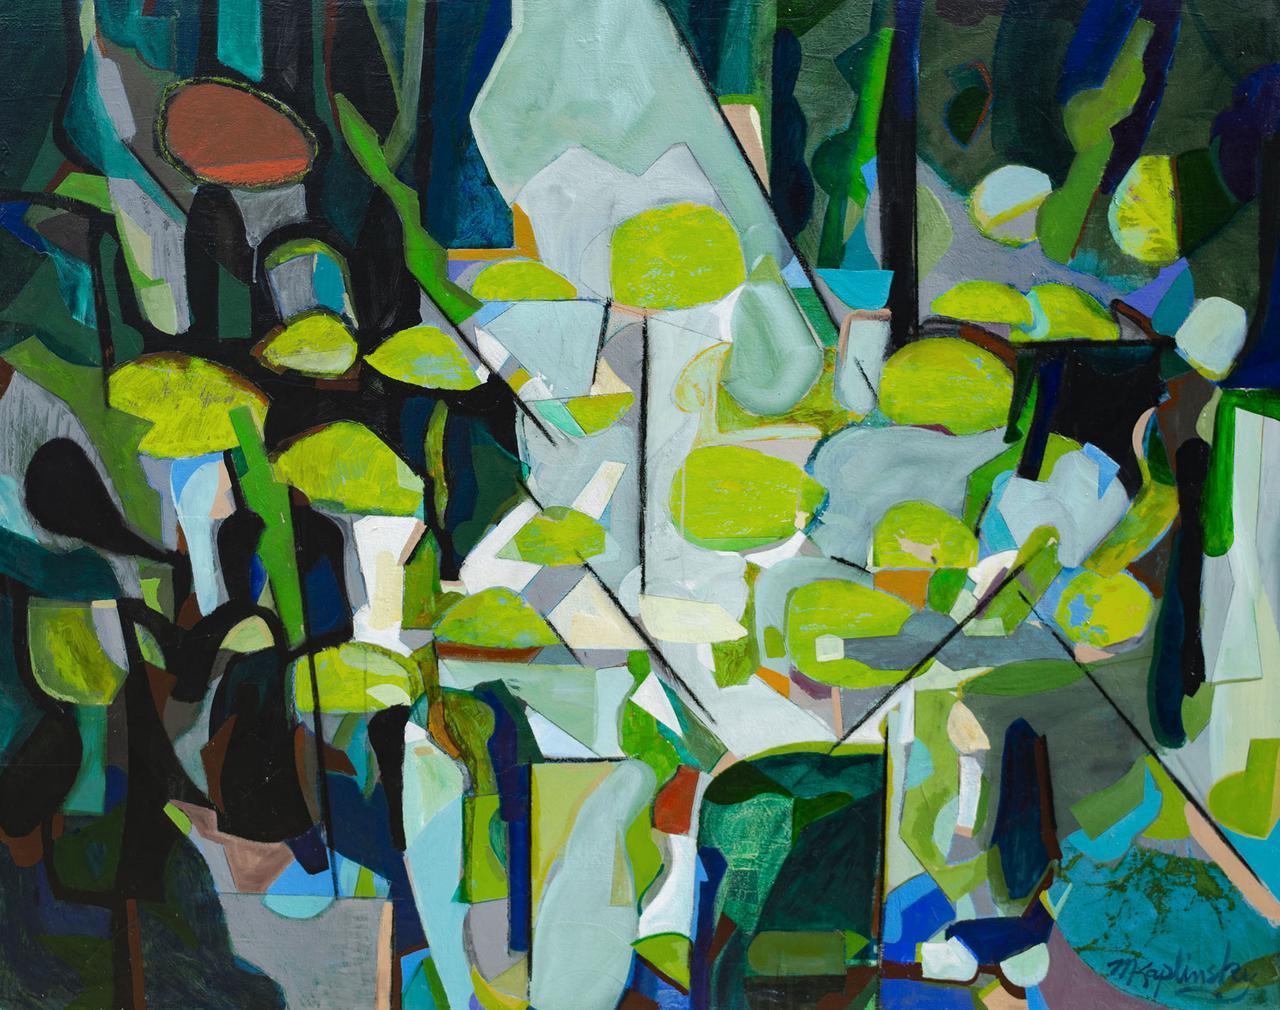 clover pond _48x60 _acrylic and paper on canvas by matt kaplinsky _web.jpg